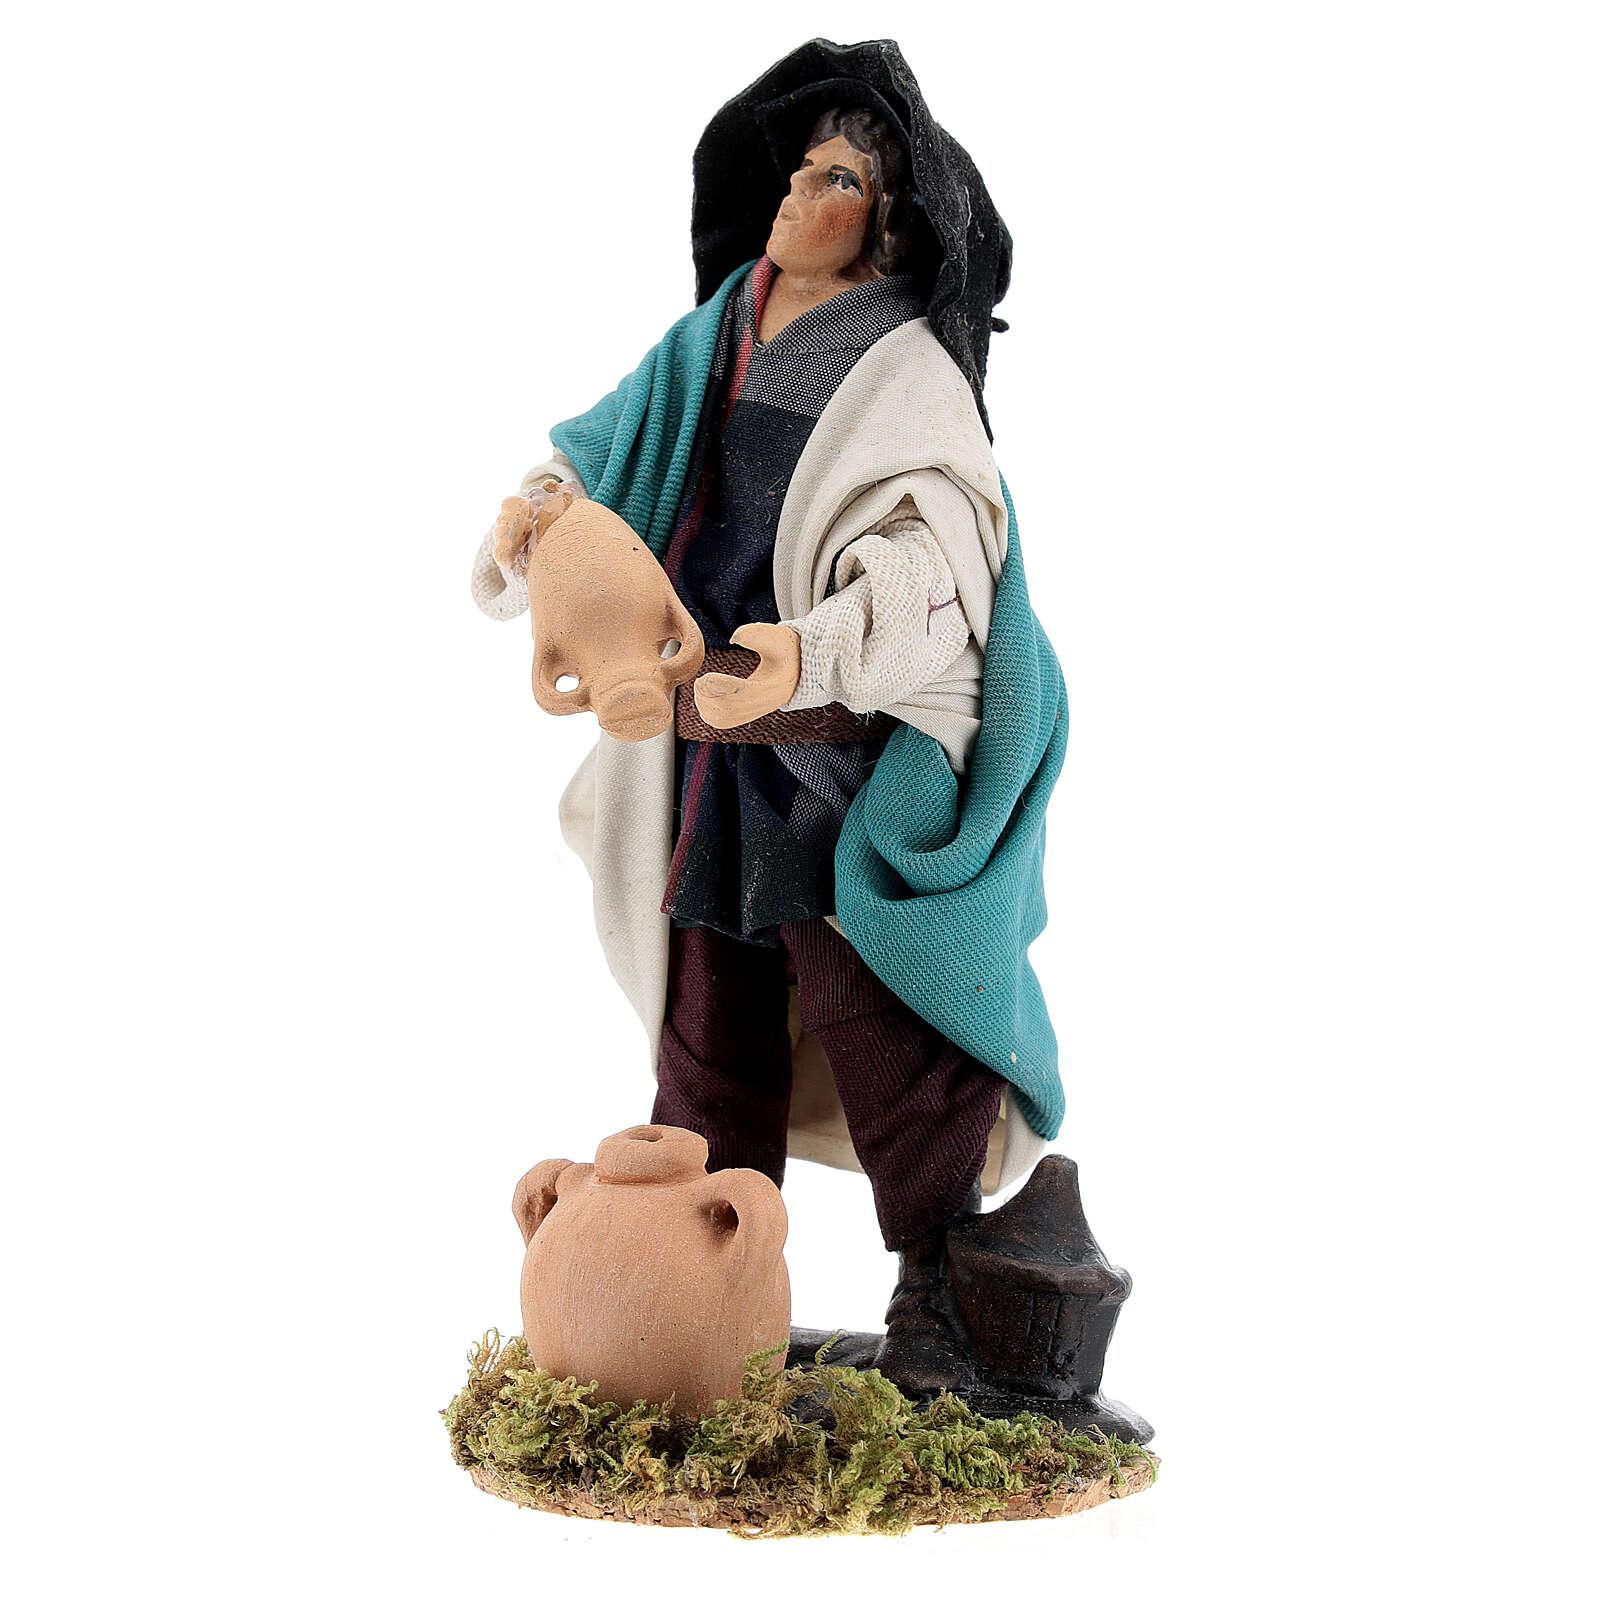 Man emptying ewer, Neapolitan nativity 12 cm terracotta 4